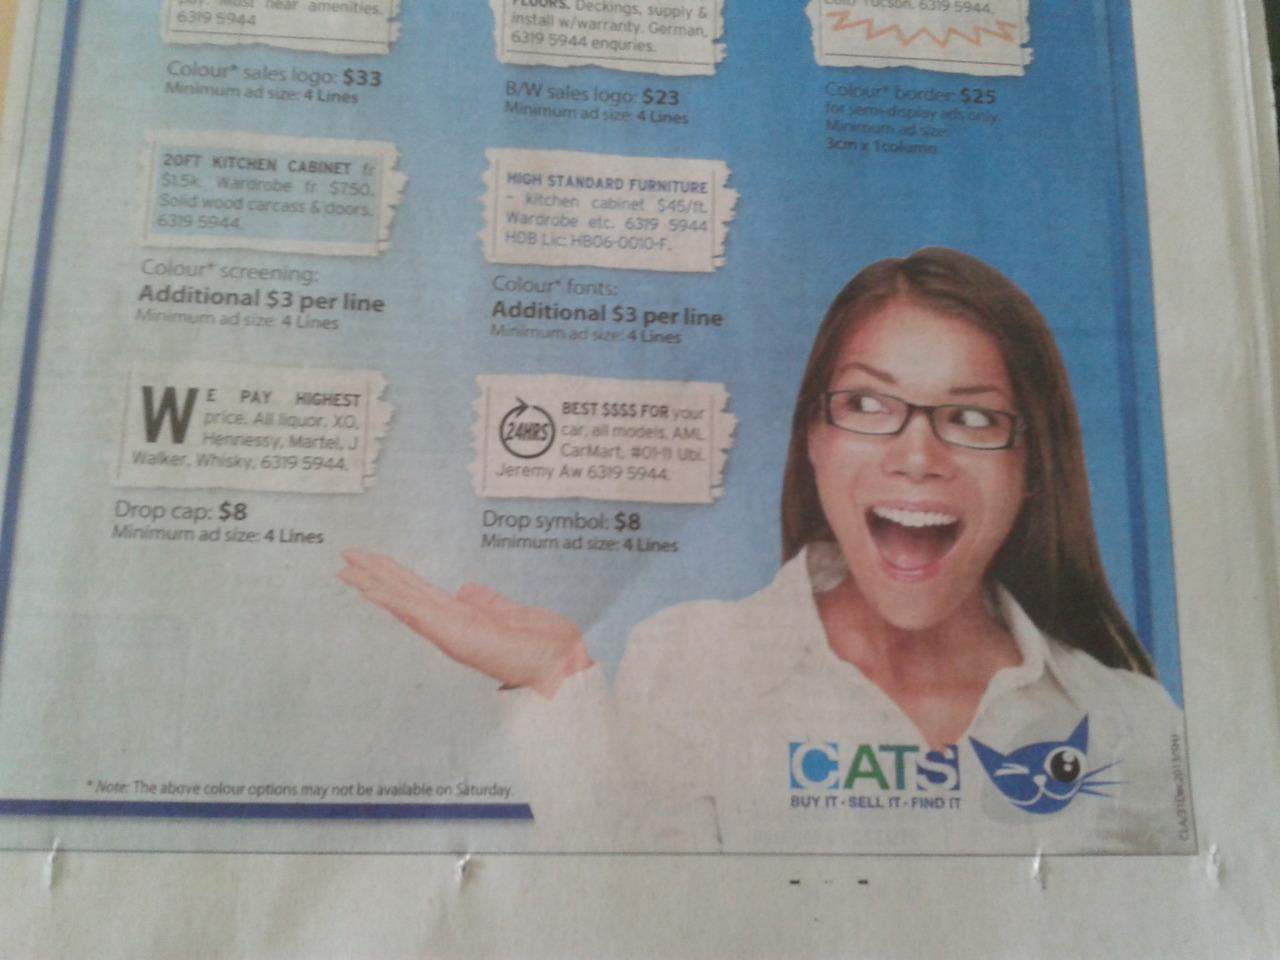 Cats newspaper advertisements